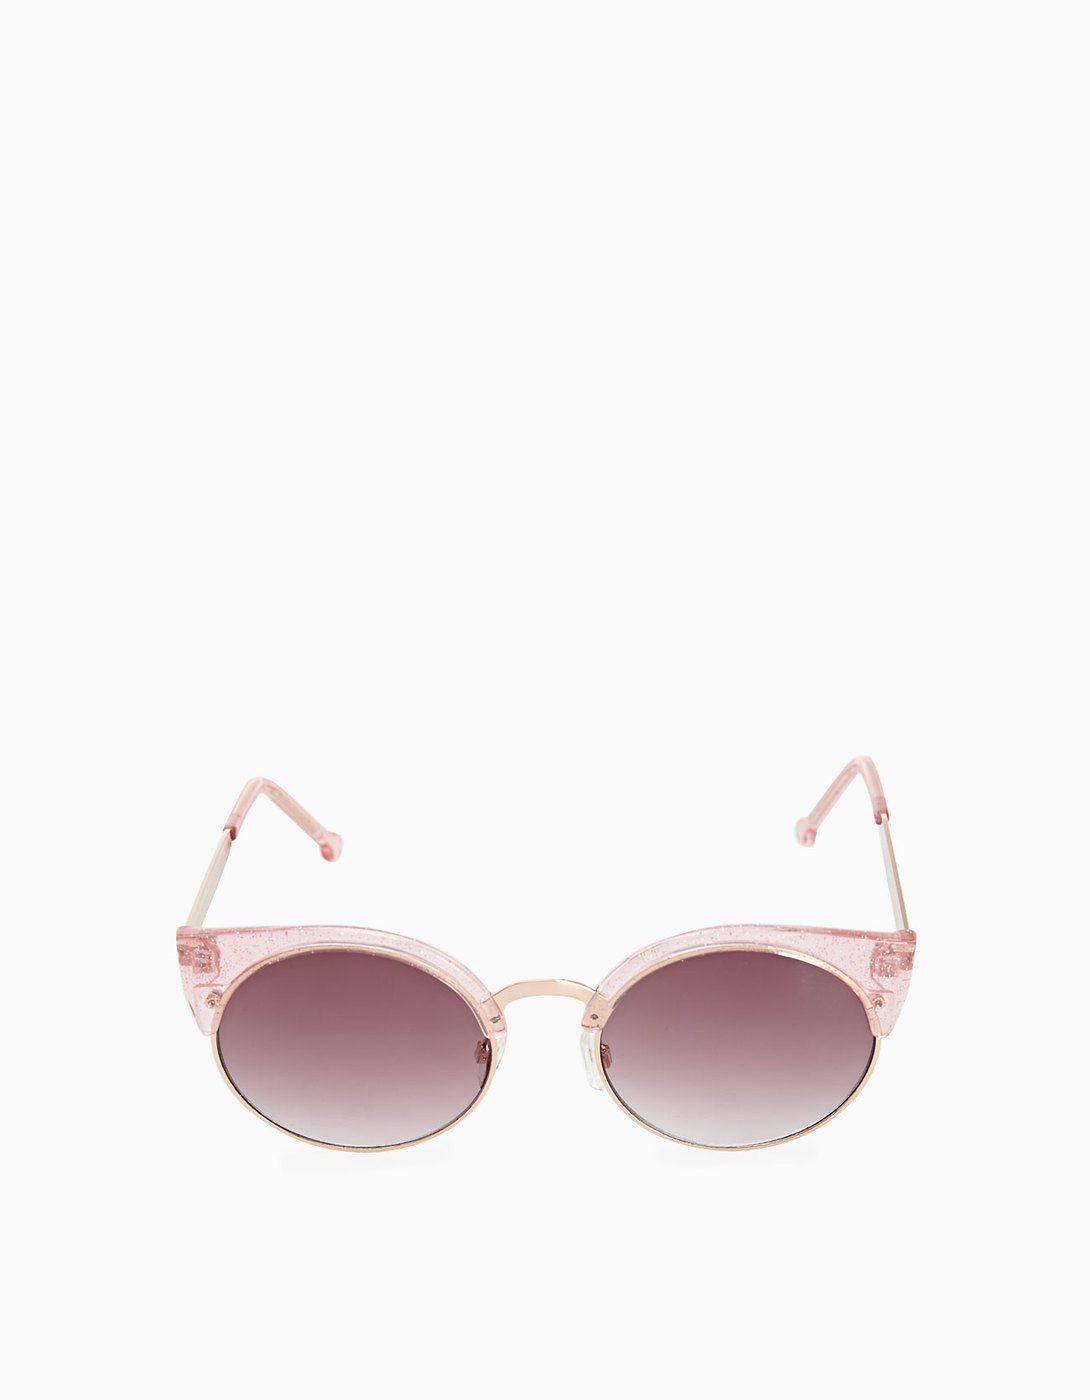 c36ecfef0c3f2 Cat s eye sunglasses with pink frames - Sunglasses